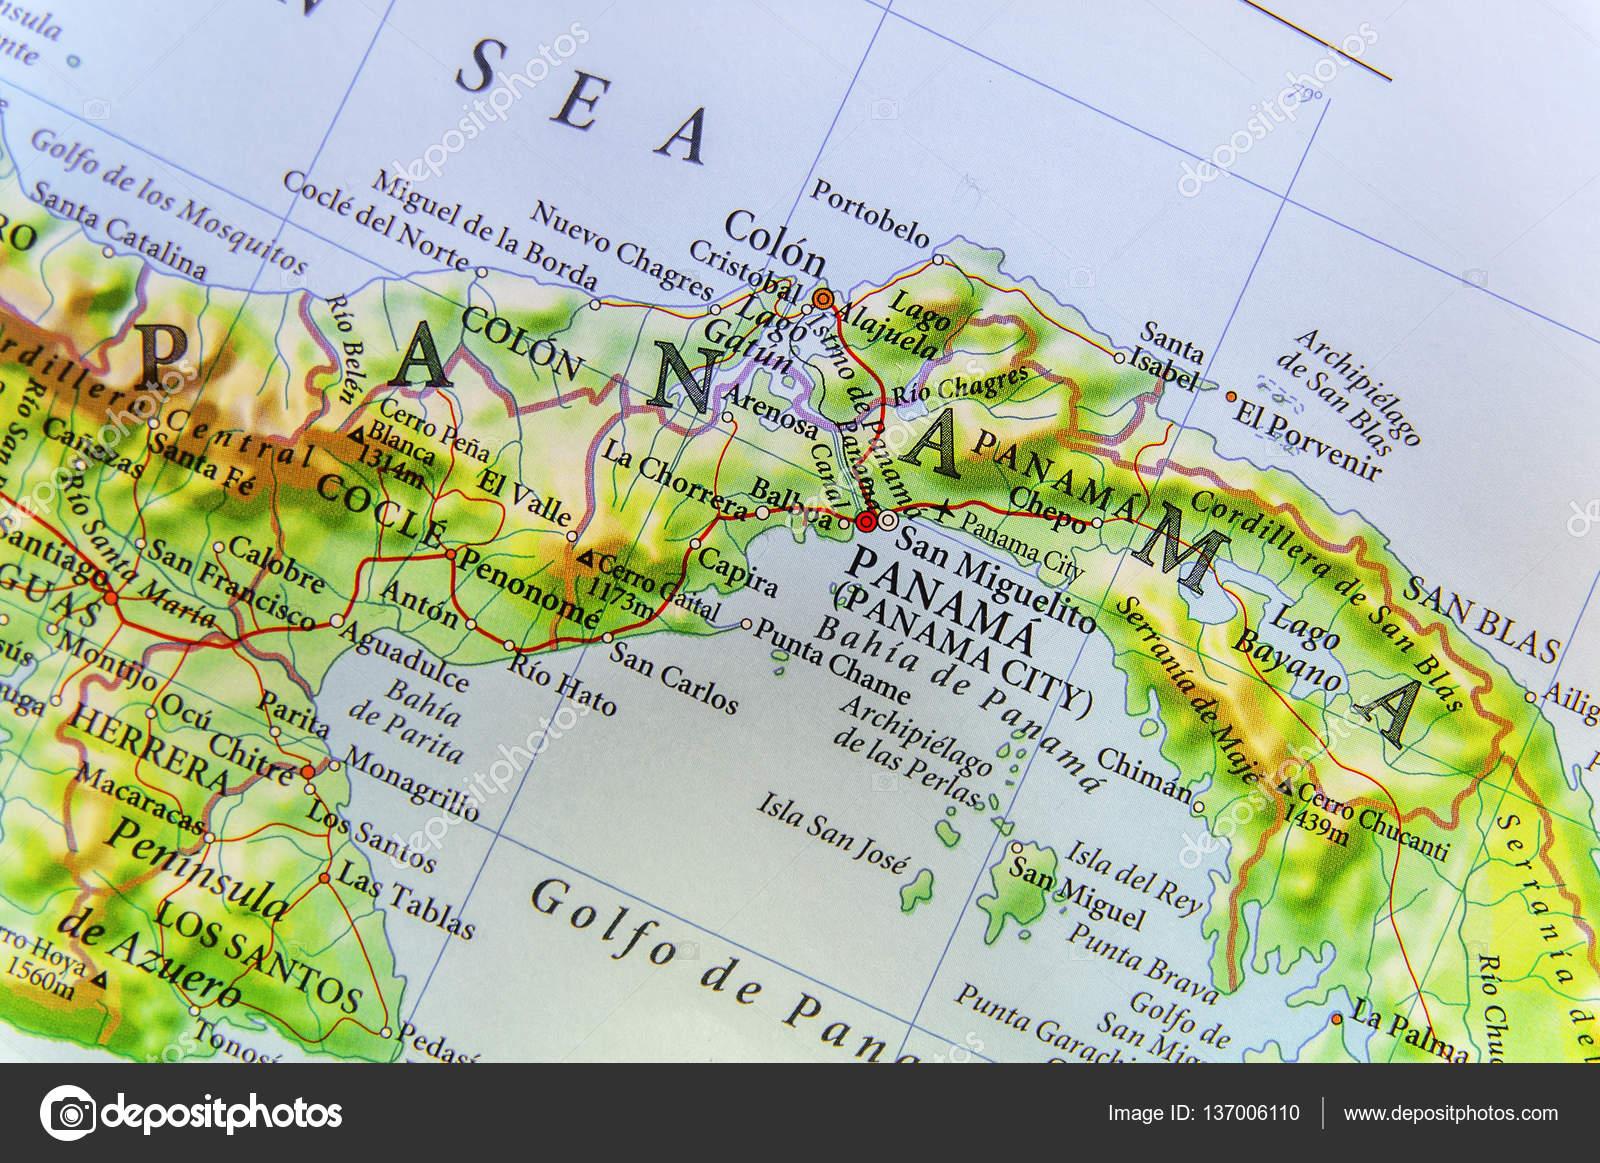 Landkarte des Landes Panama und Panama city — Stockfoto ...